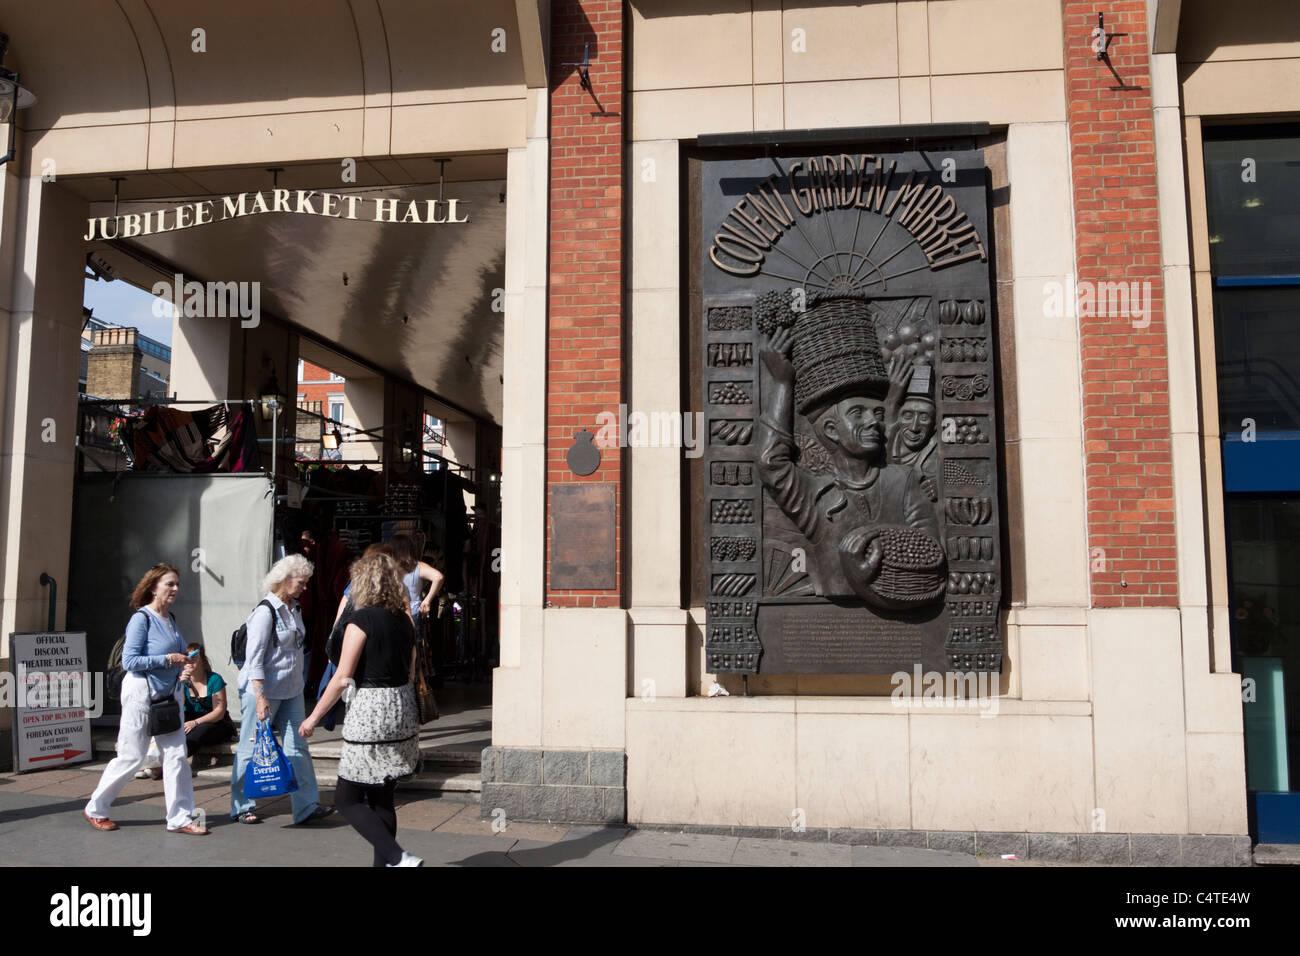 Covent Garden Market bronze plaque, London, England, UK - Stock Image